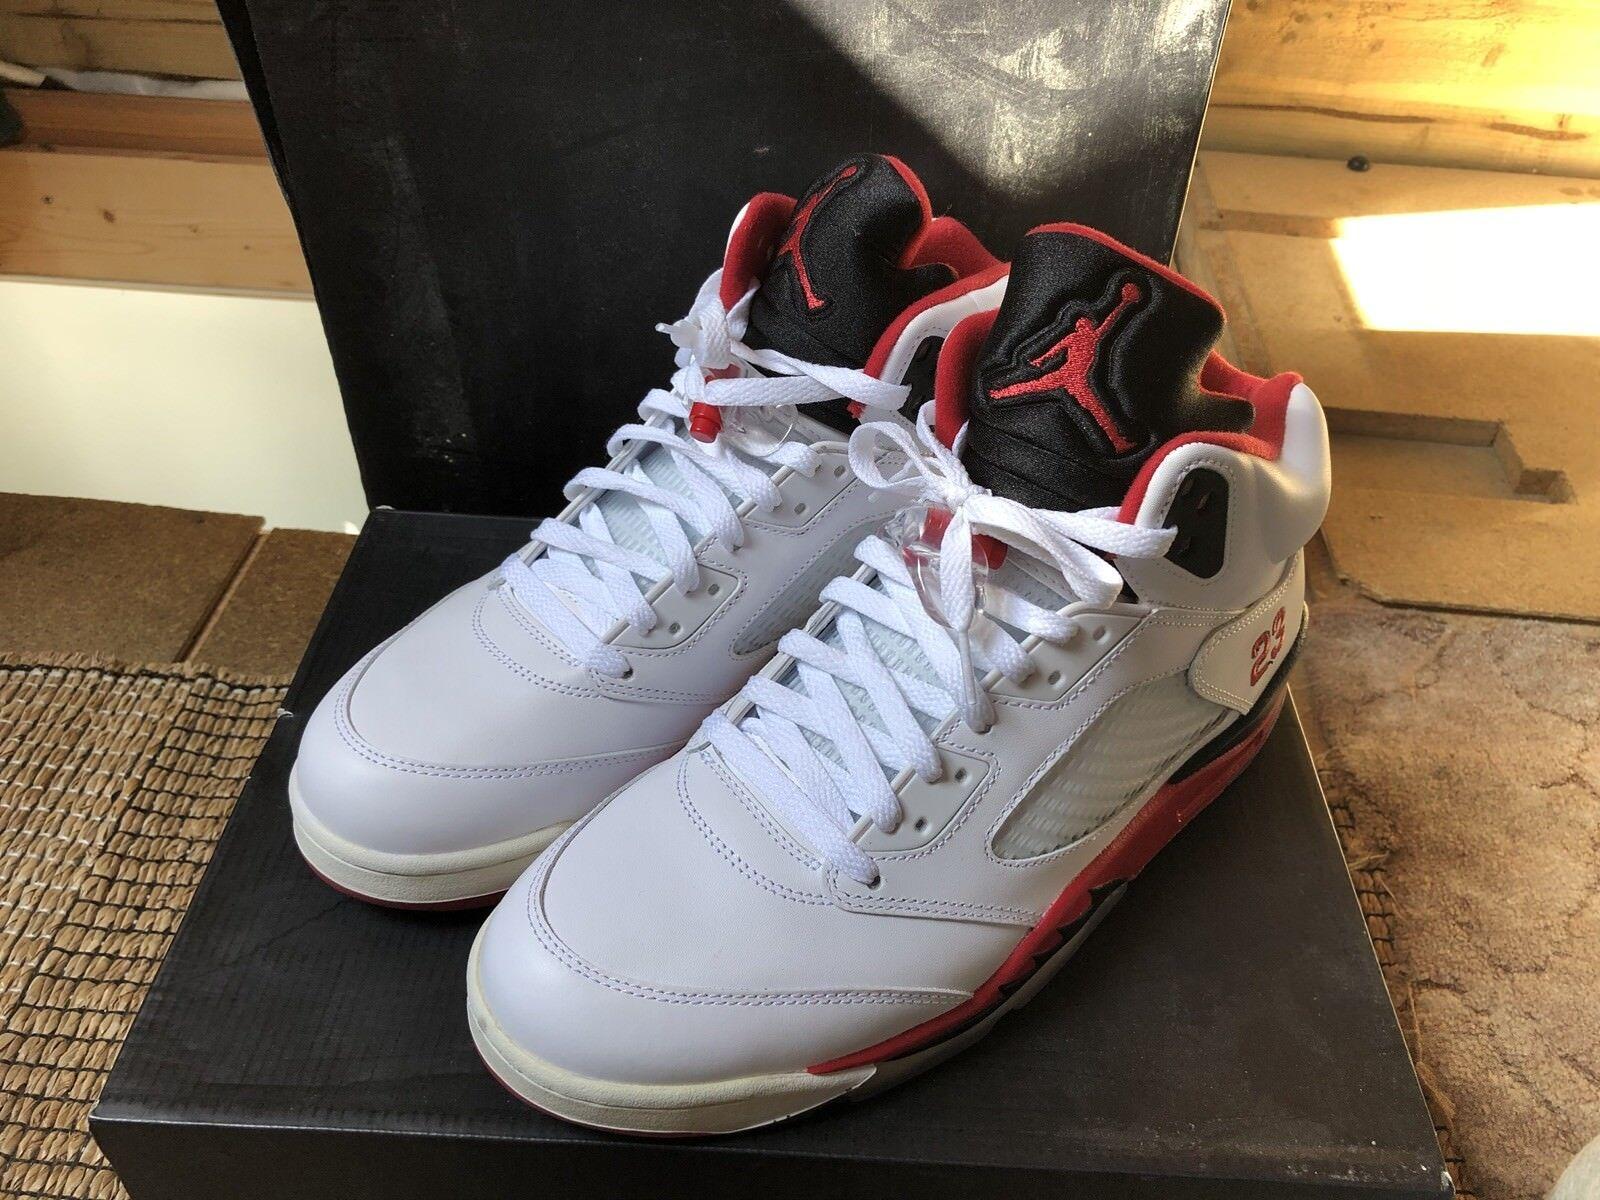 Nike Air Jordan Retro 5 Fire Red   Black Tongue. UK11